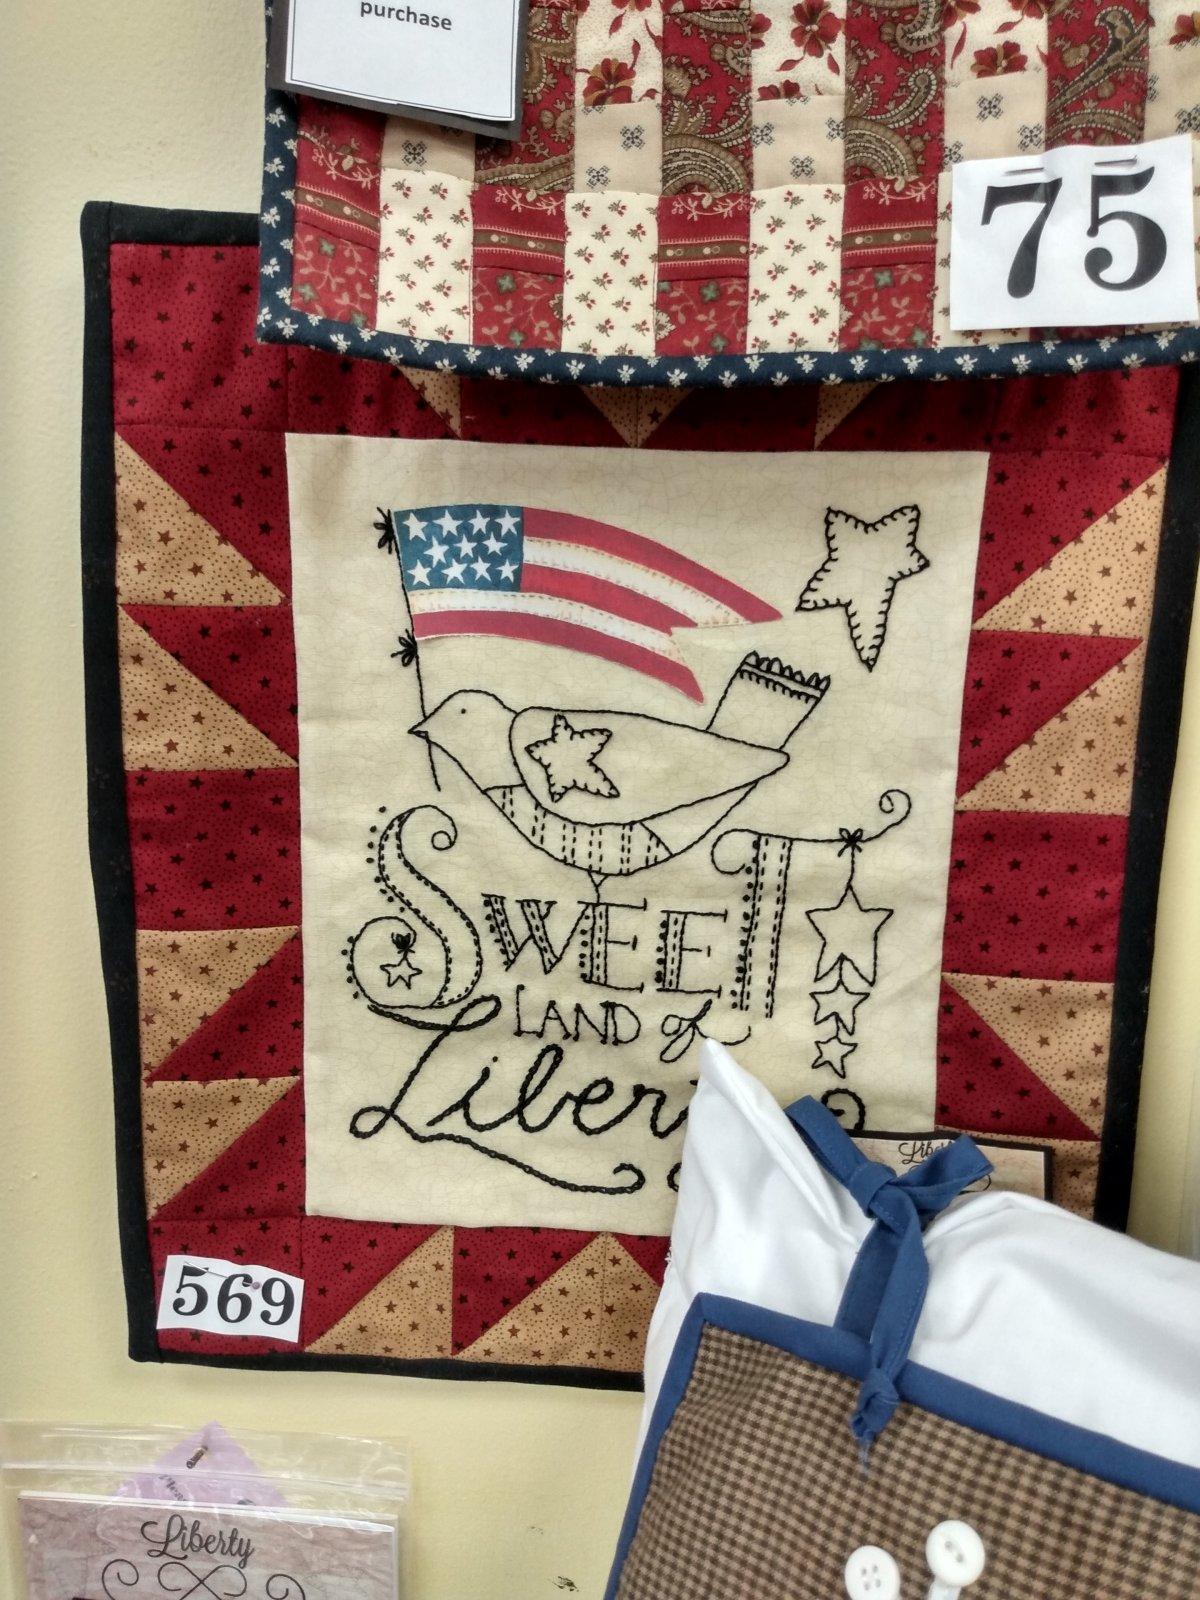 Sample - E Liberty - LB 8/23/16